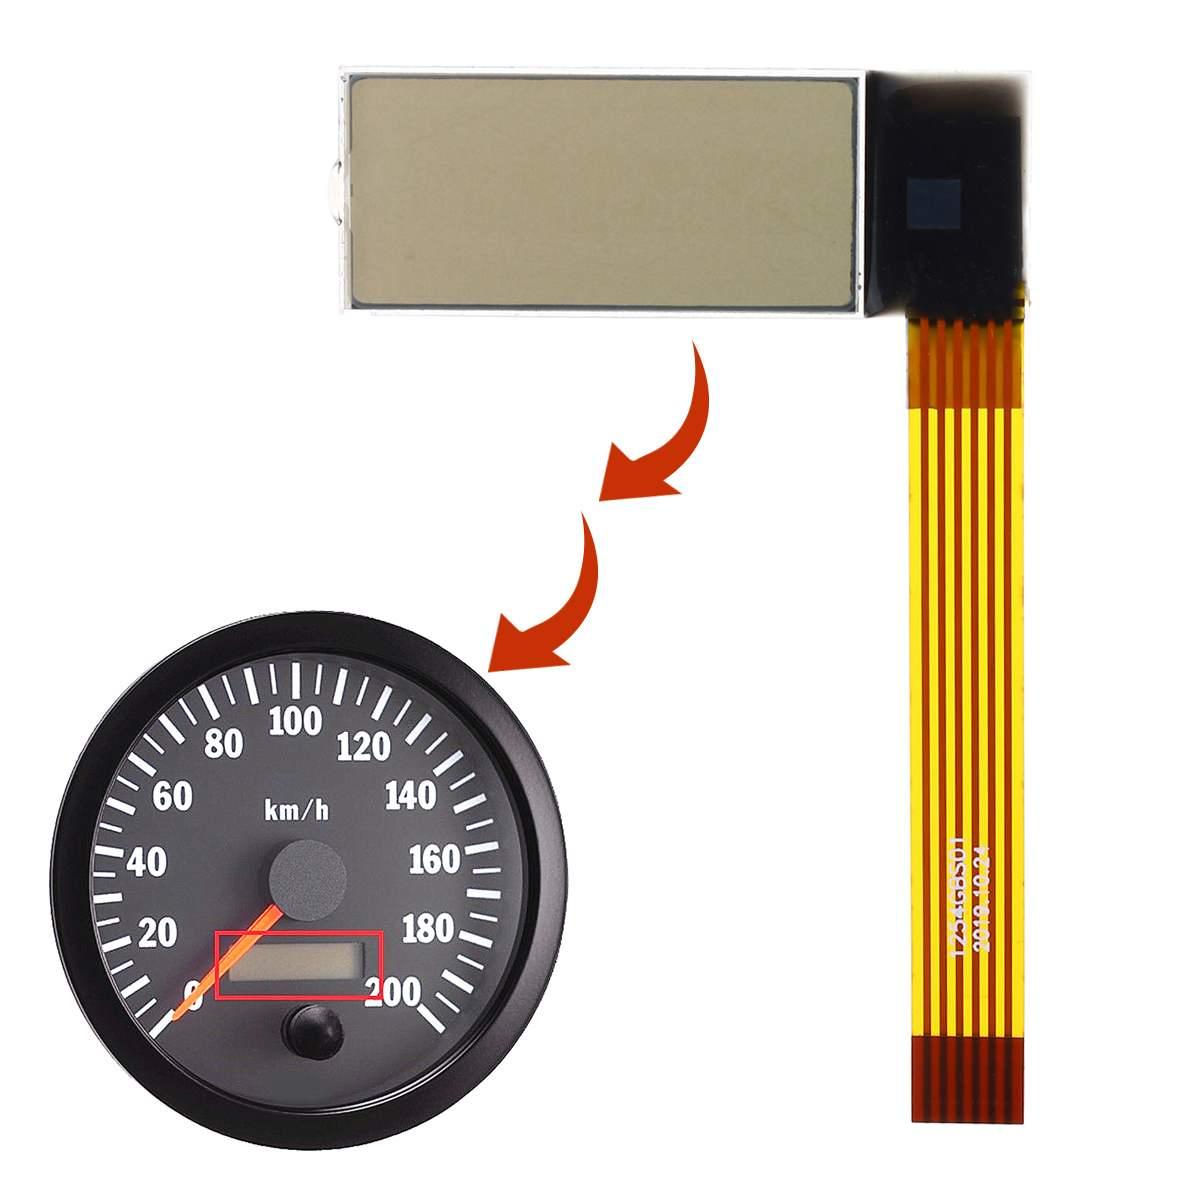 Velocímetro tacómetro LCD pantalla para máxima Kenworth trucks máxima cabina visión Jcb tractor Volvo penta barco 41,5*2,7*15*52mm